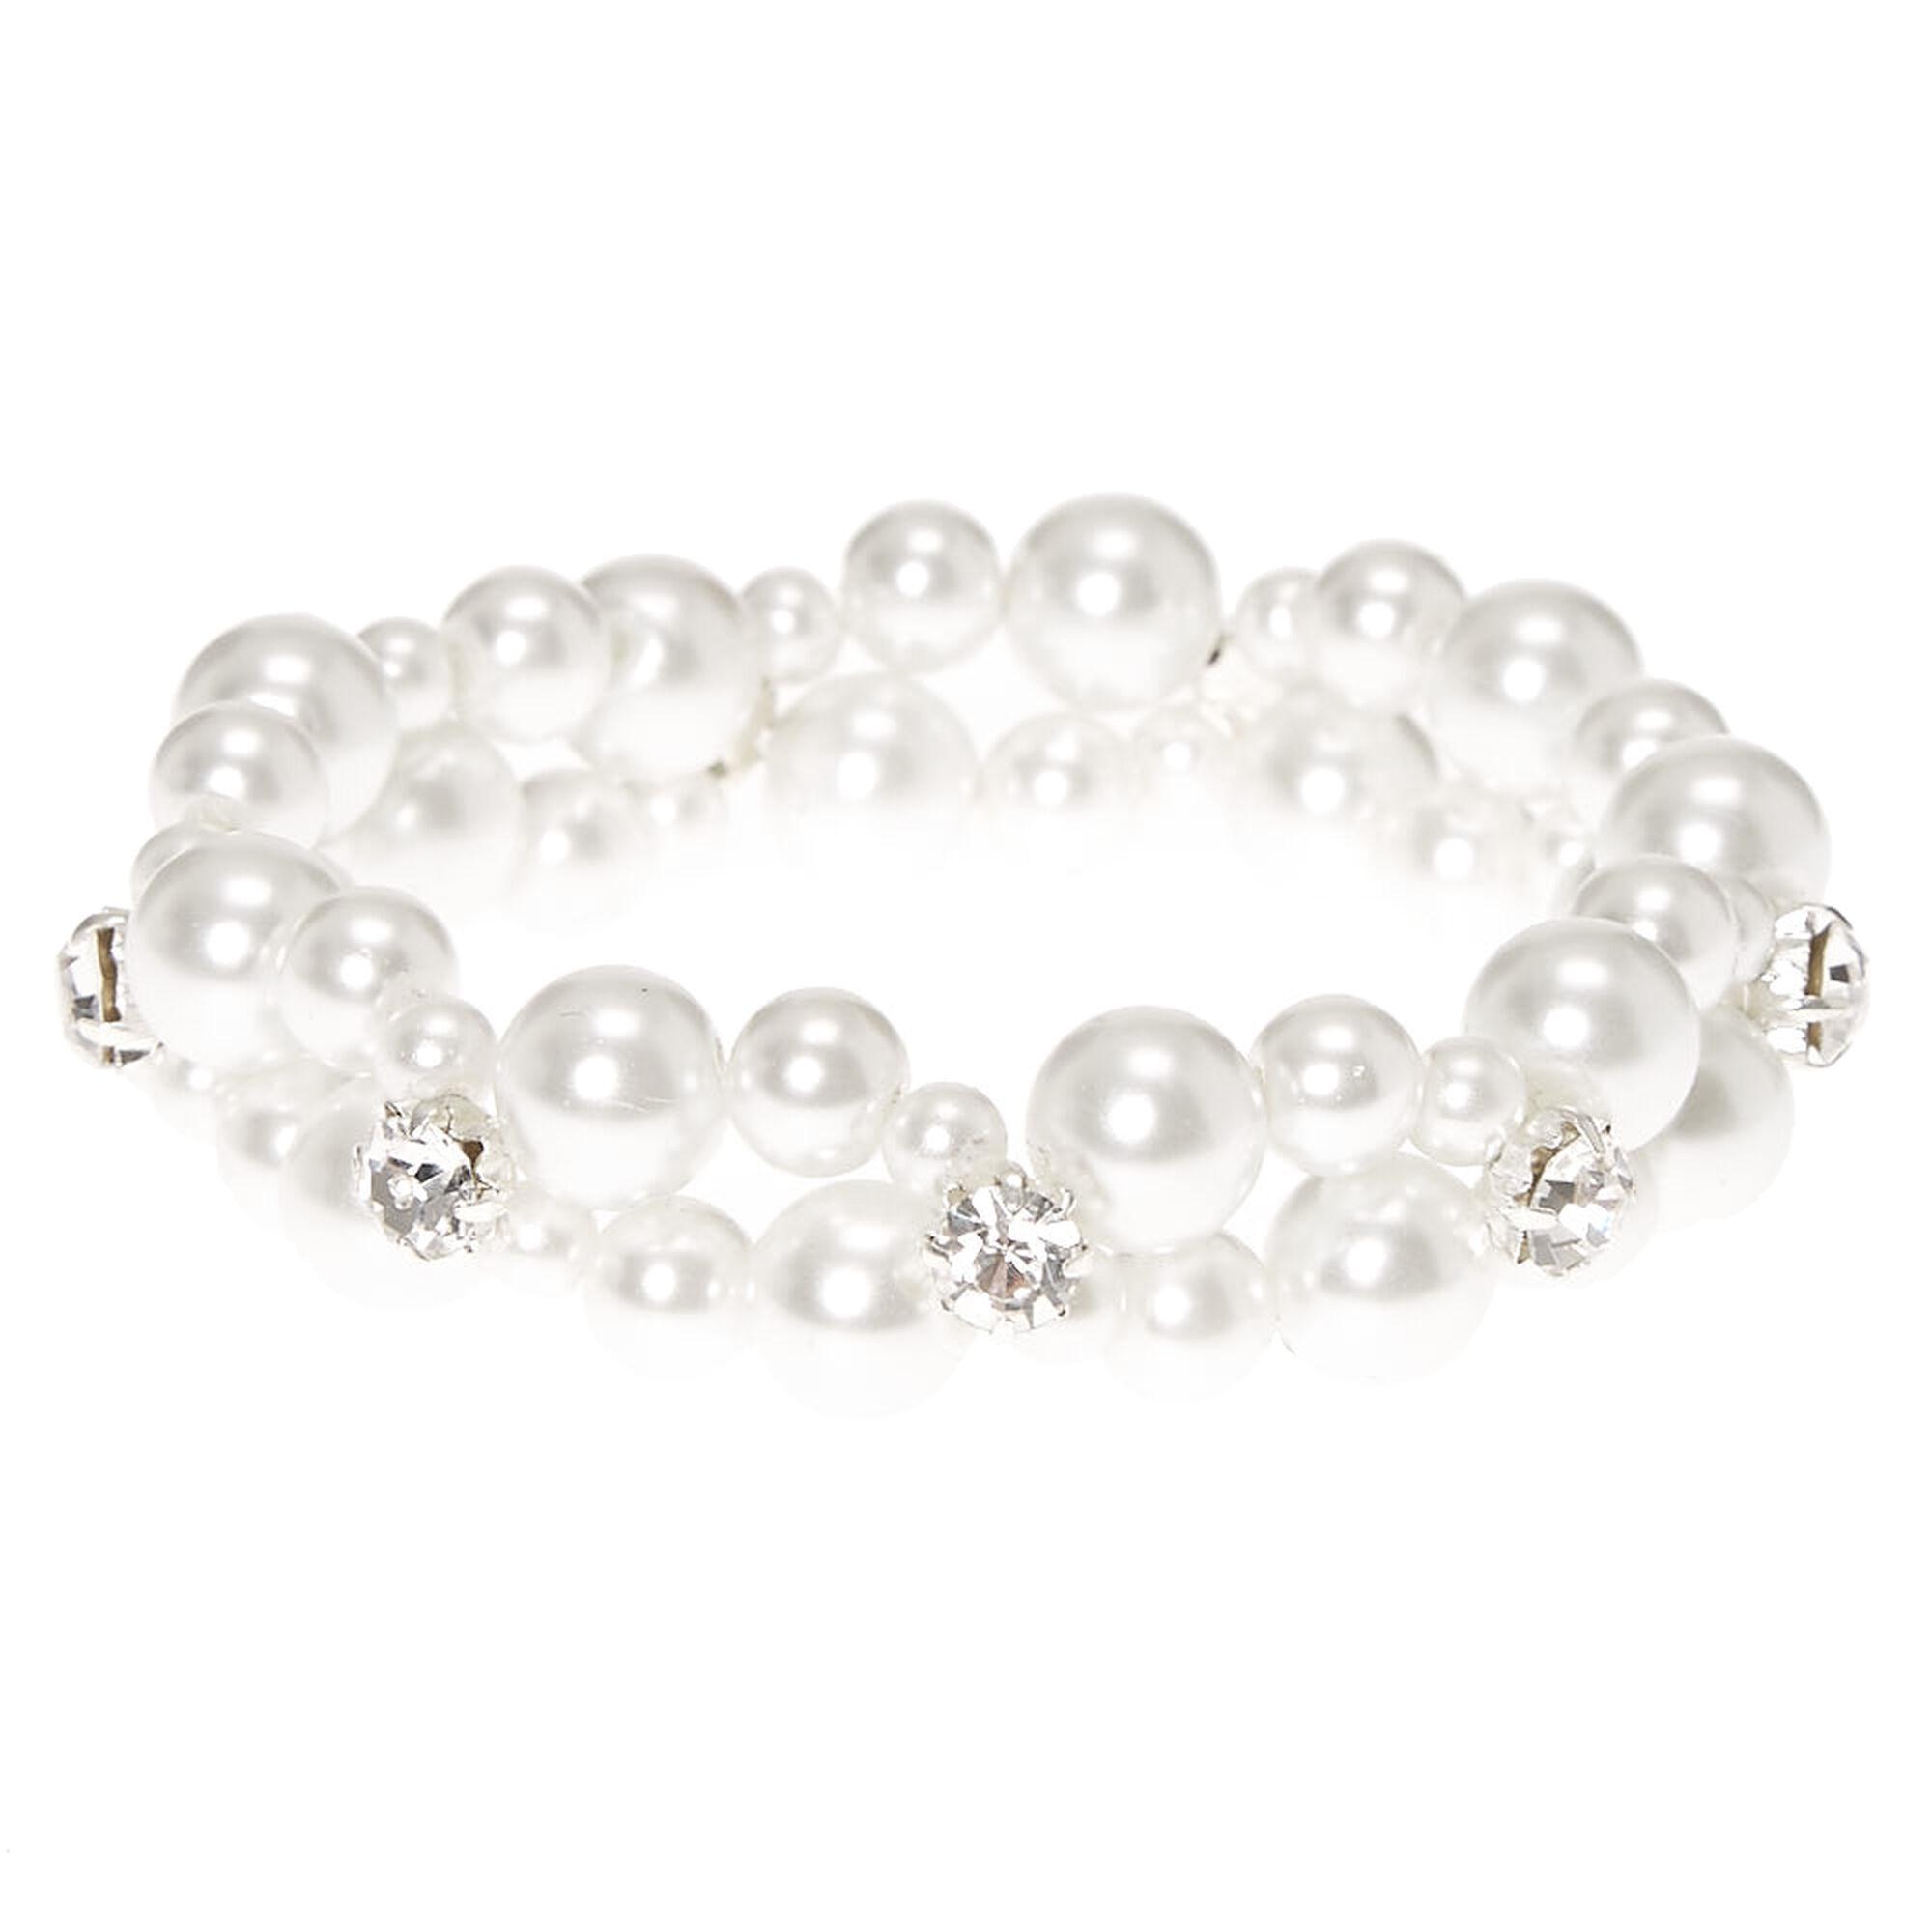 eda82b40a9443 Double Row Faux White Pearl Bracelet